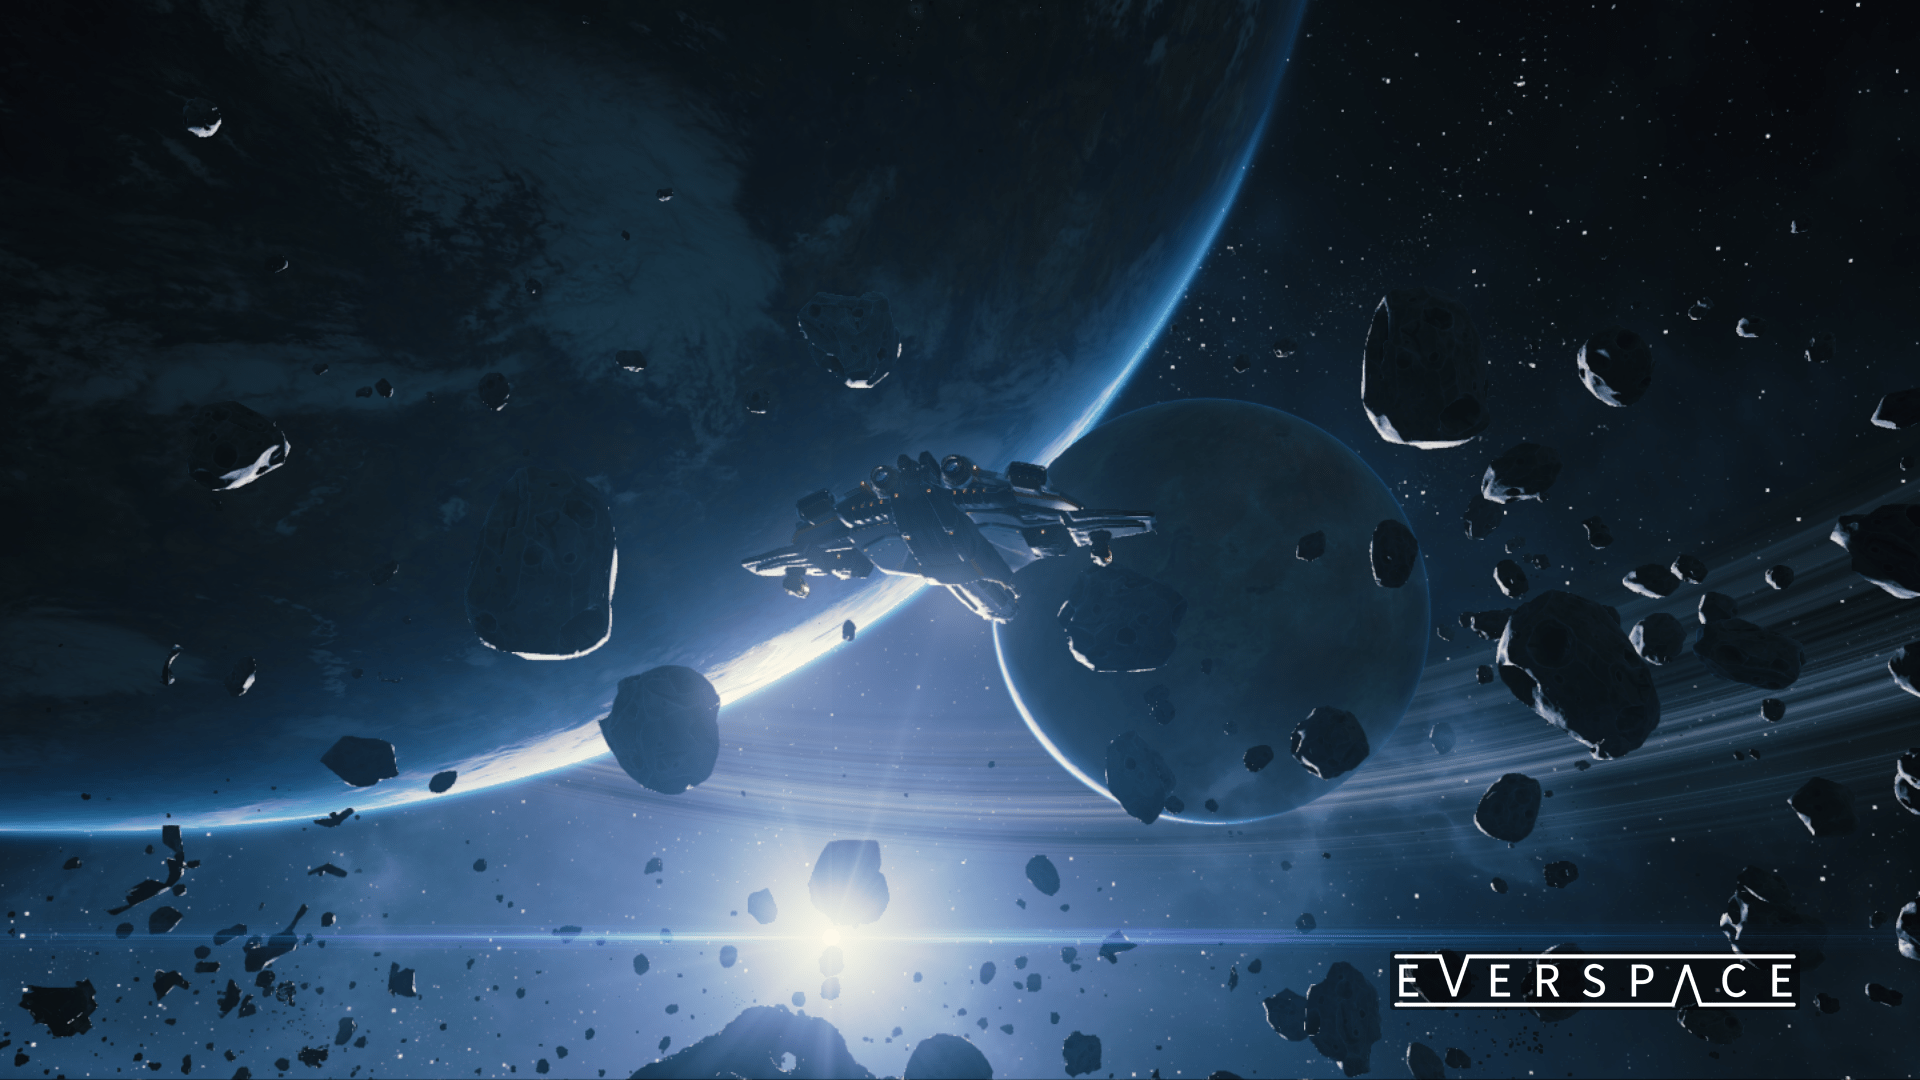 Everspace Screenhot 5